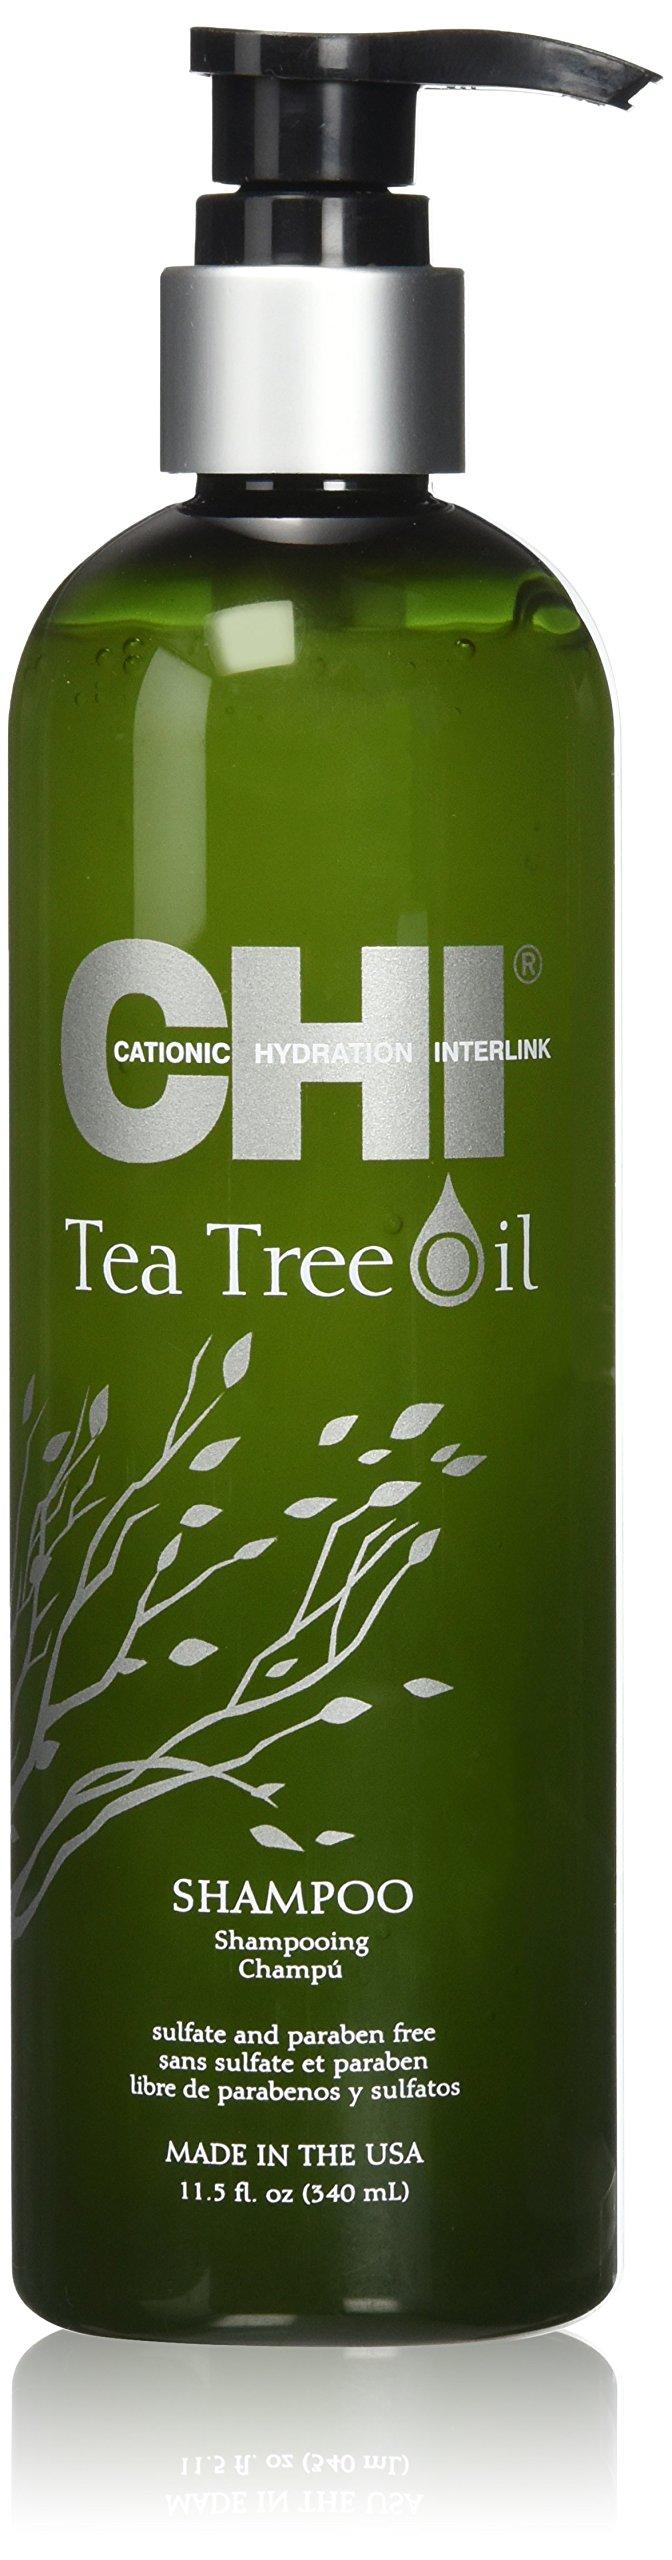 CHI Tea Tree Oil Shampoo,11.5 FL Oz by CHI